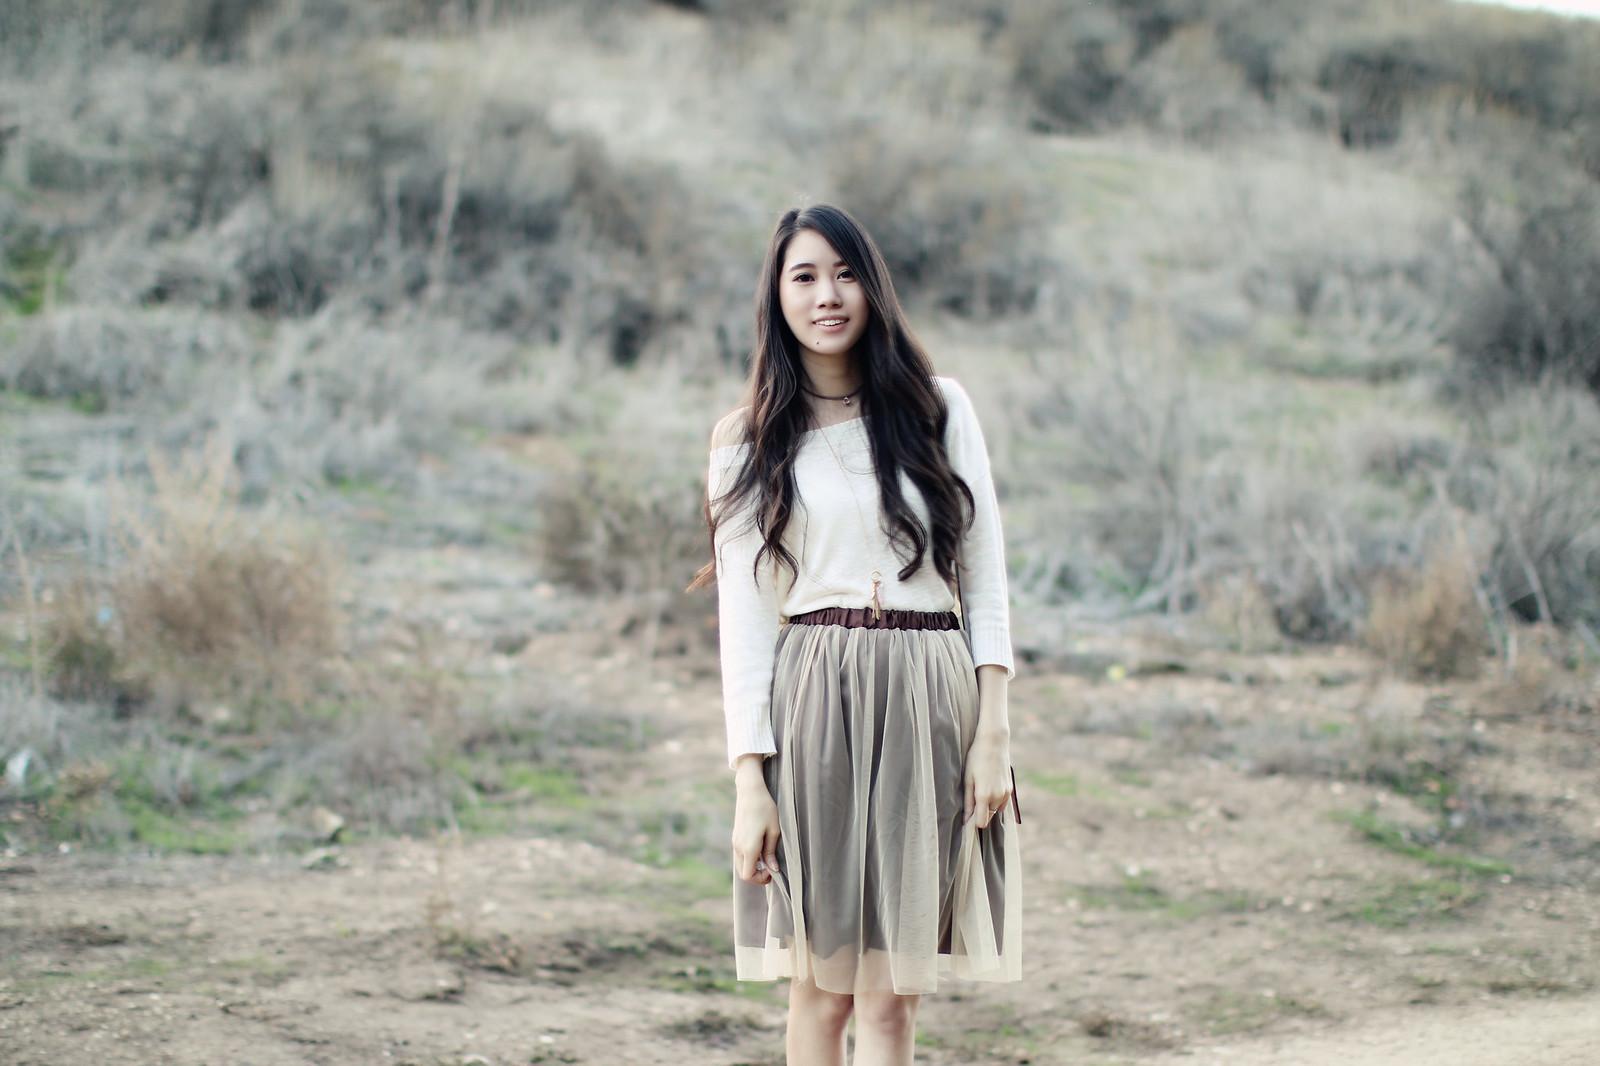 1338-ootd-fashion-chiffon-lace-skirt-openback-sweater-express-holiday2016-lookbook-korean-fashion-elizabeeetht-clothestoyouuu